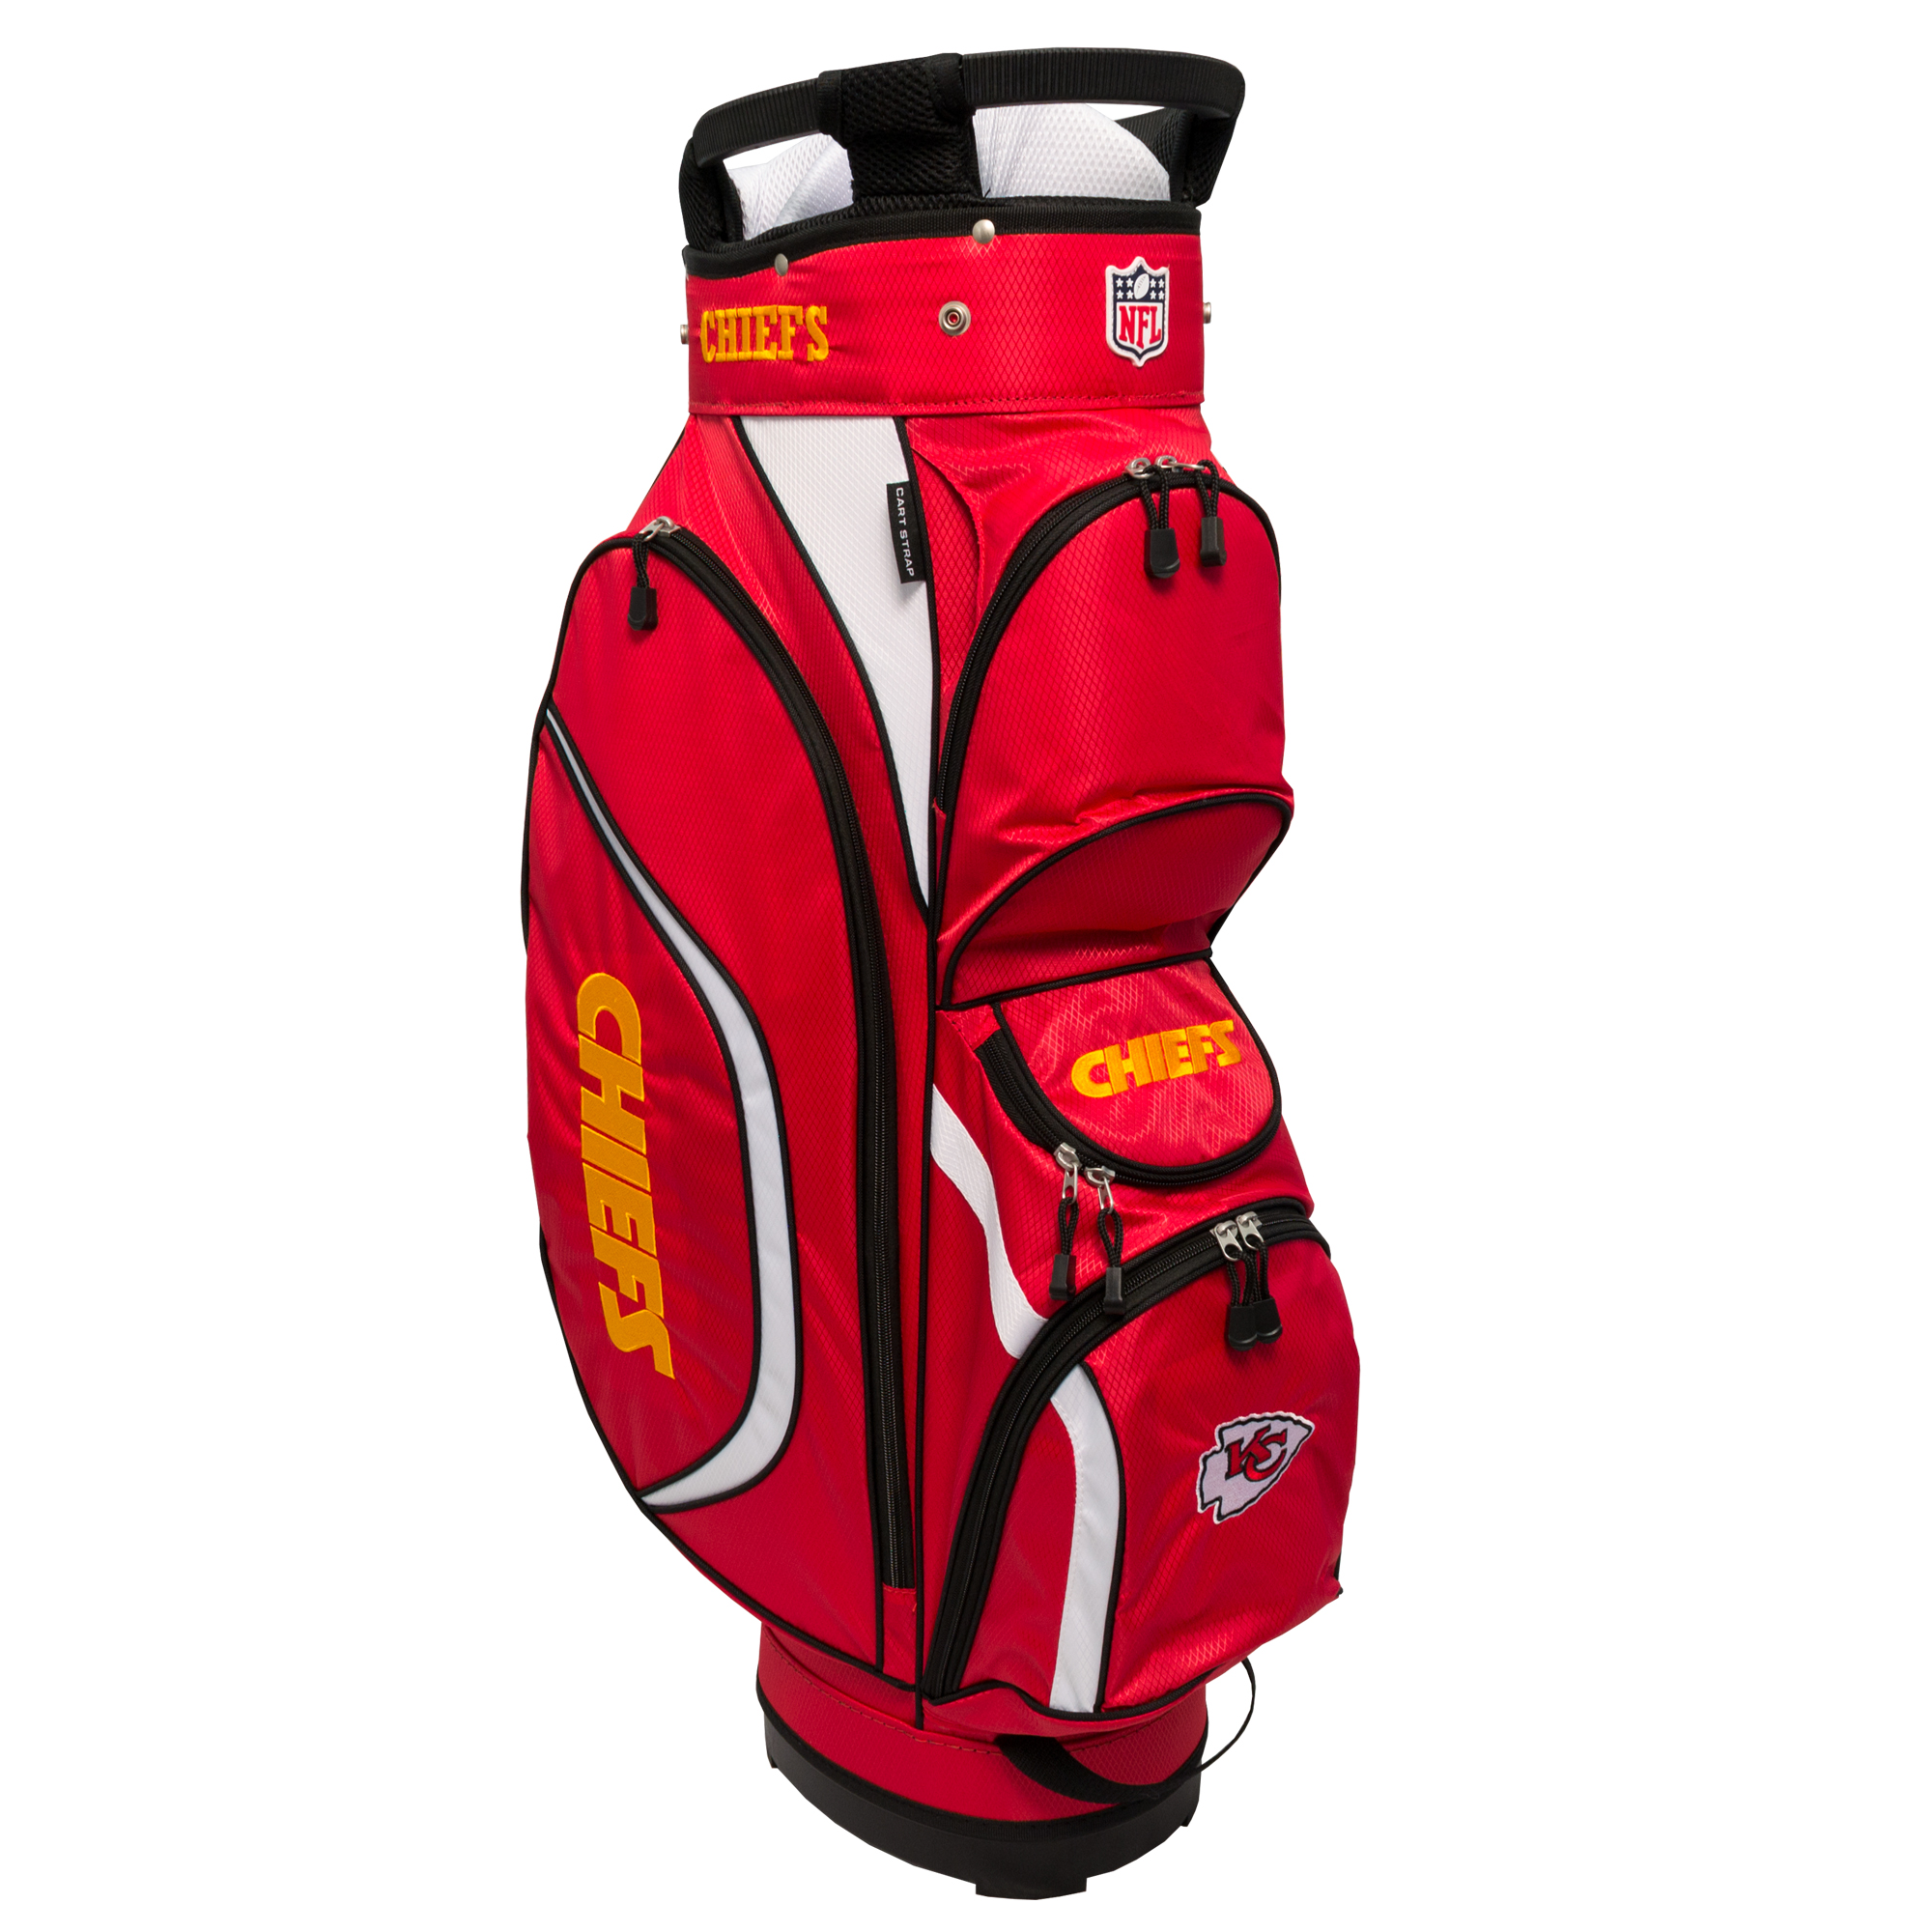 7b27ea7ddbe Team Golf NFL Kansas City Chiefs Clubhouse Golf Cart Bag